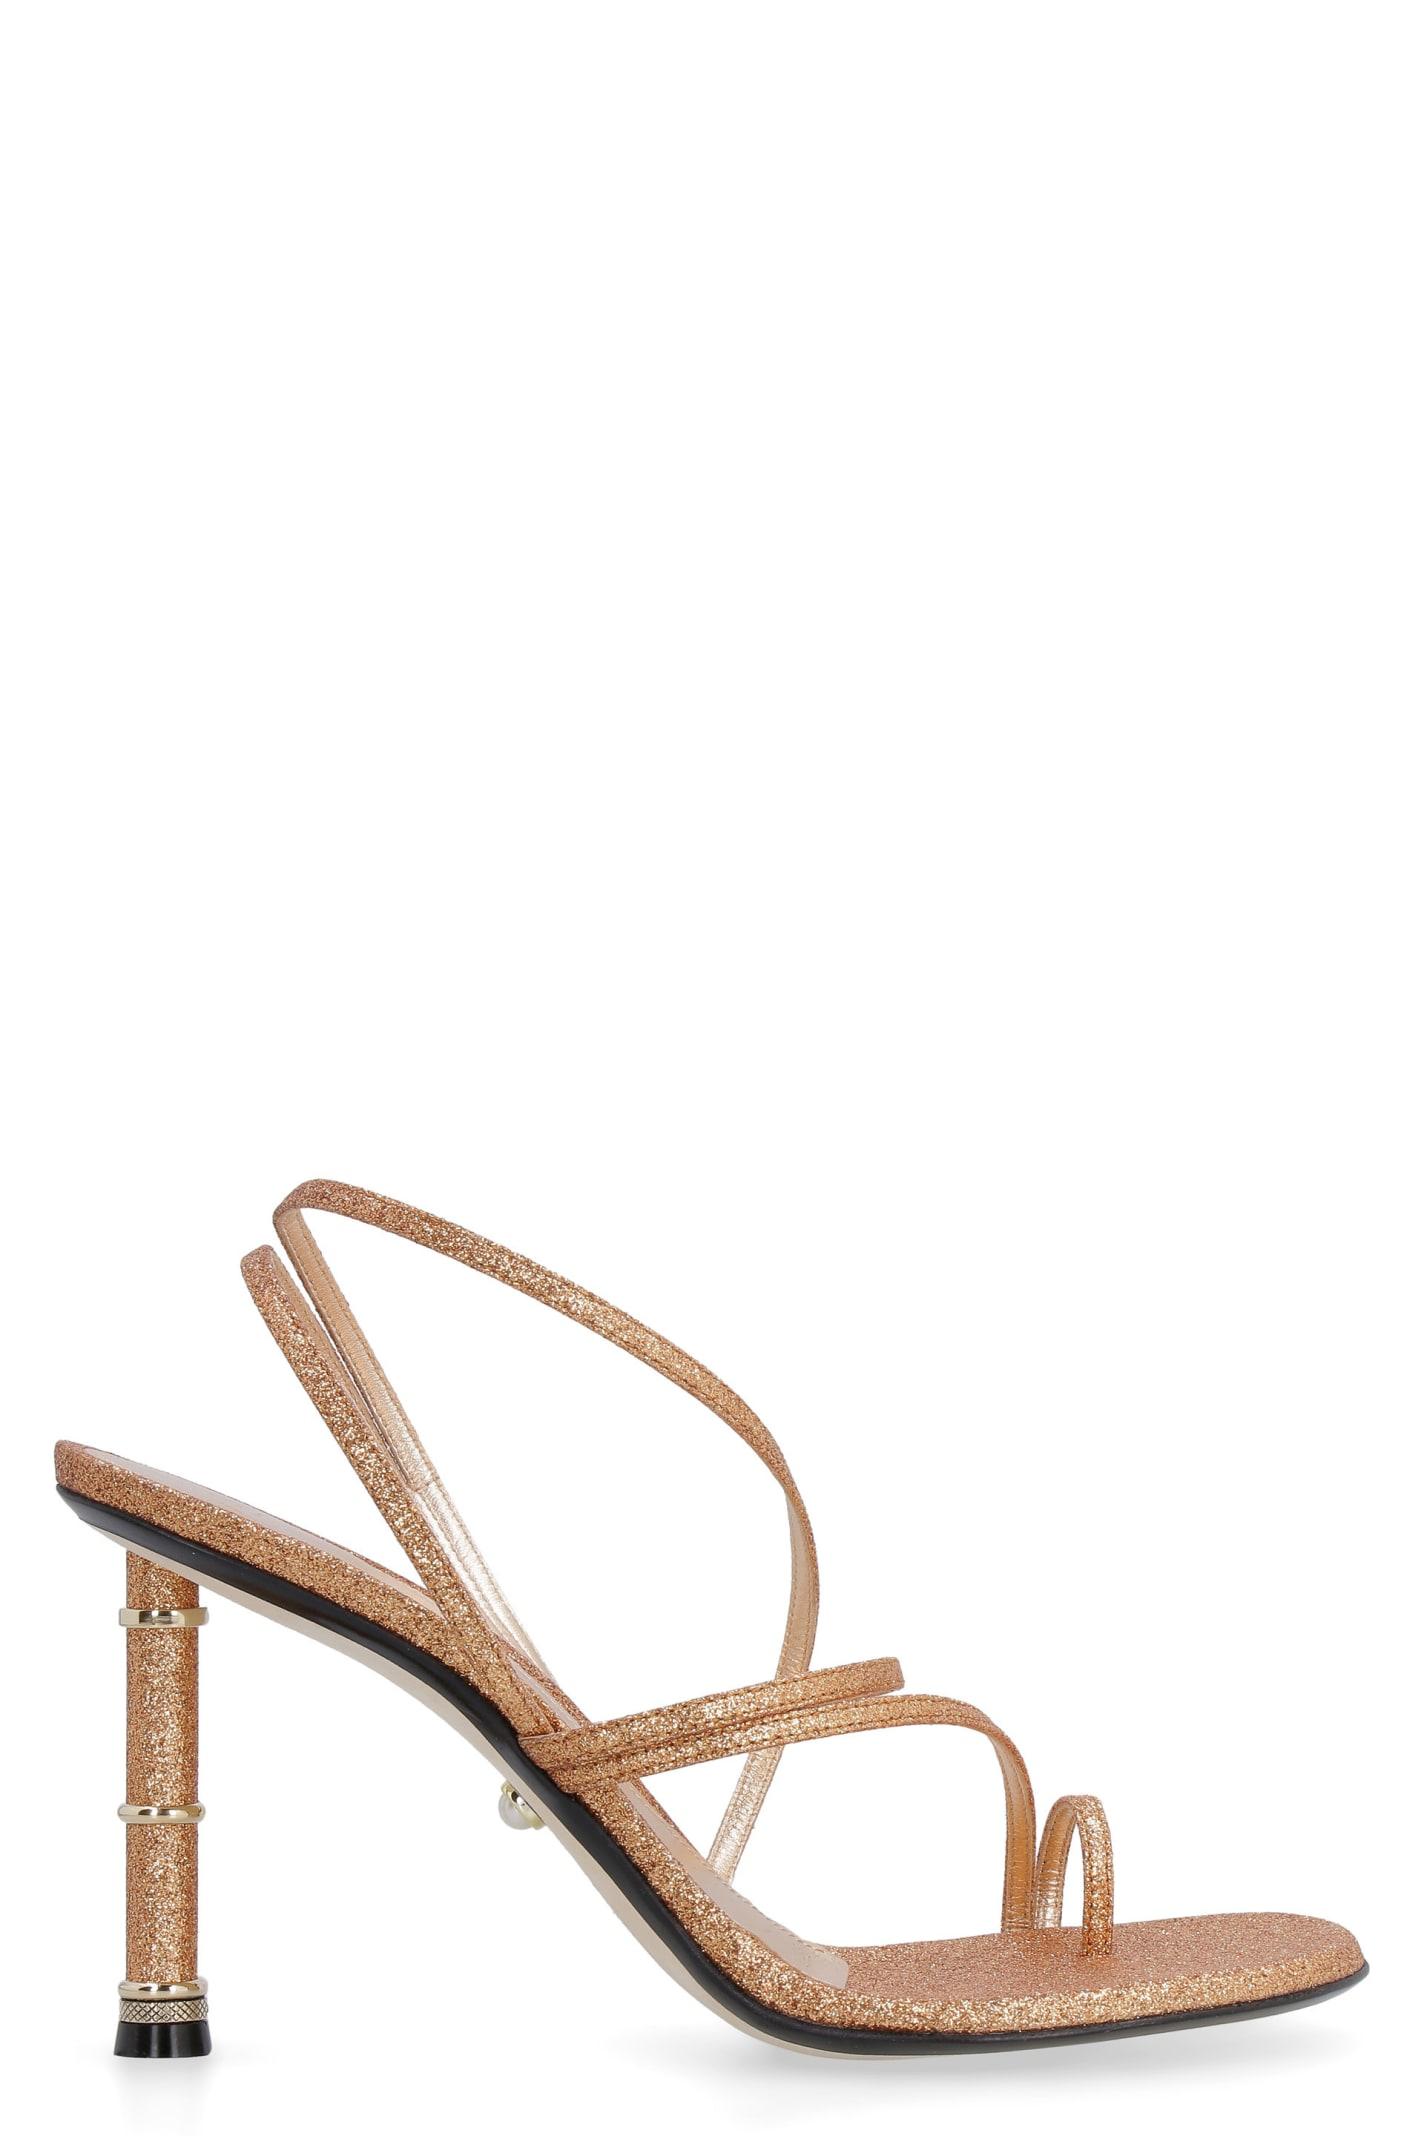 Carlotta Glitter Sandals